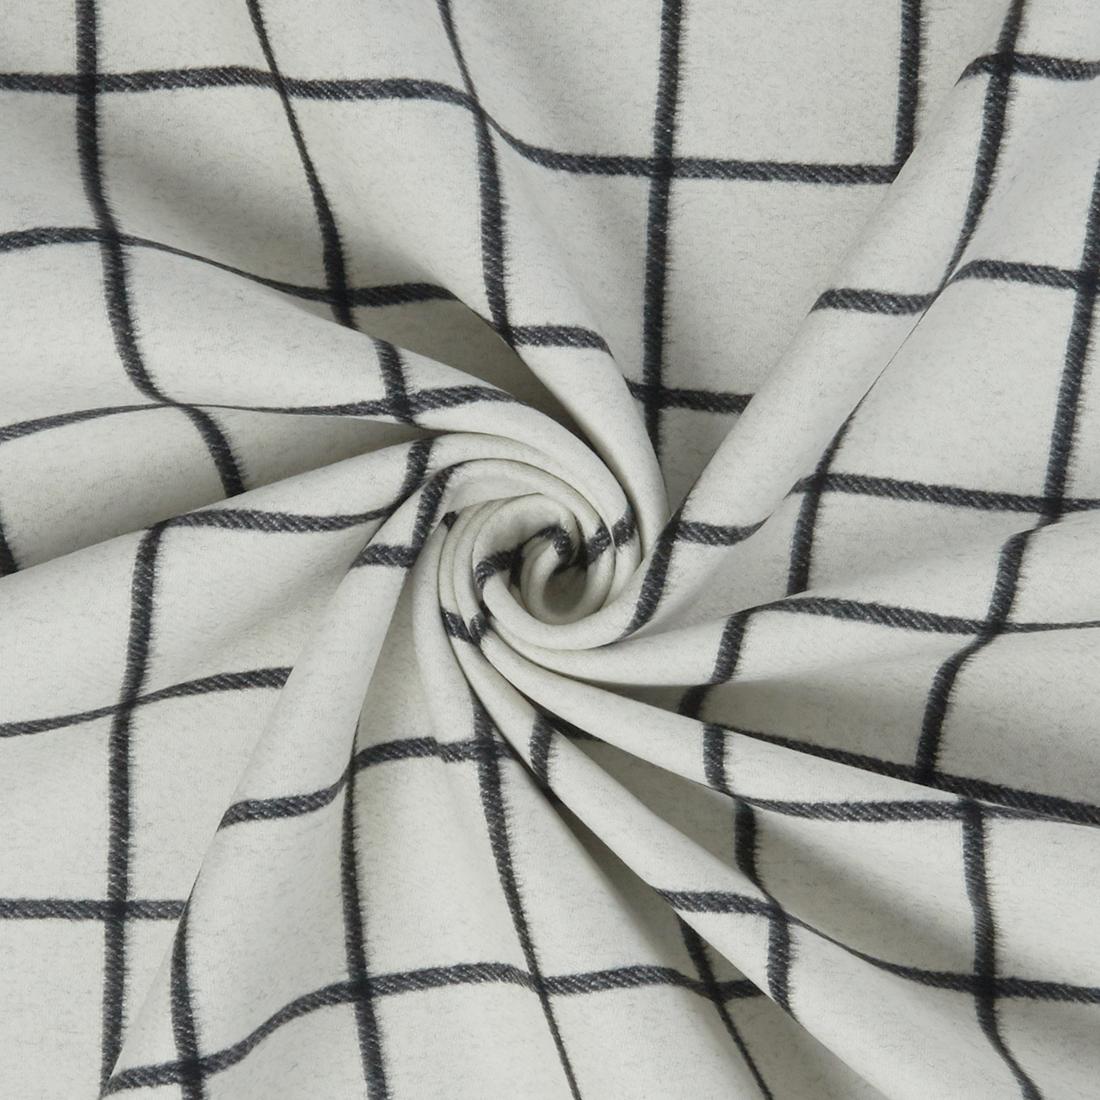 Reversible Wool Check Black White Dress Fabric